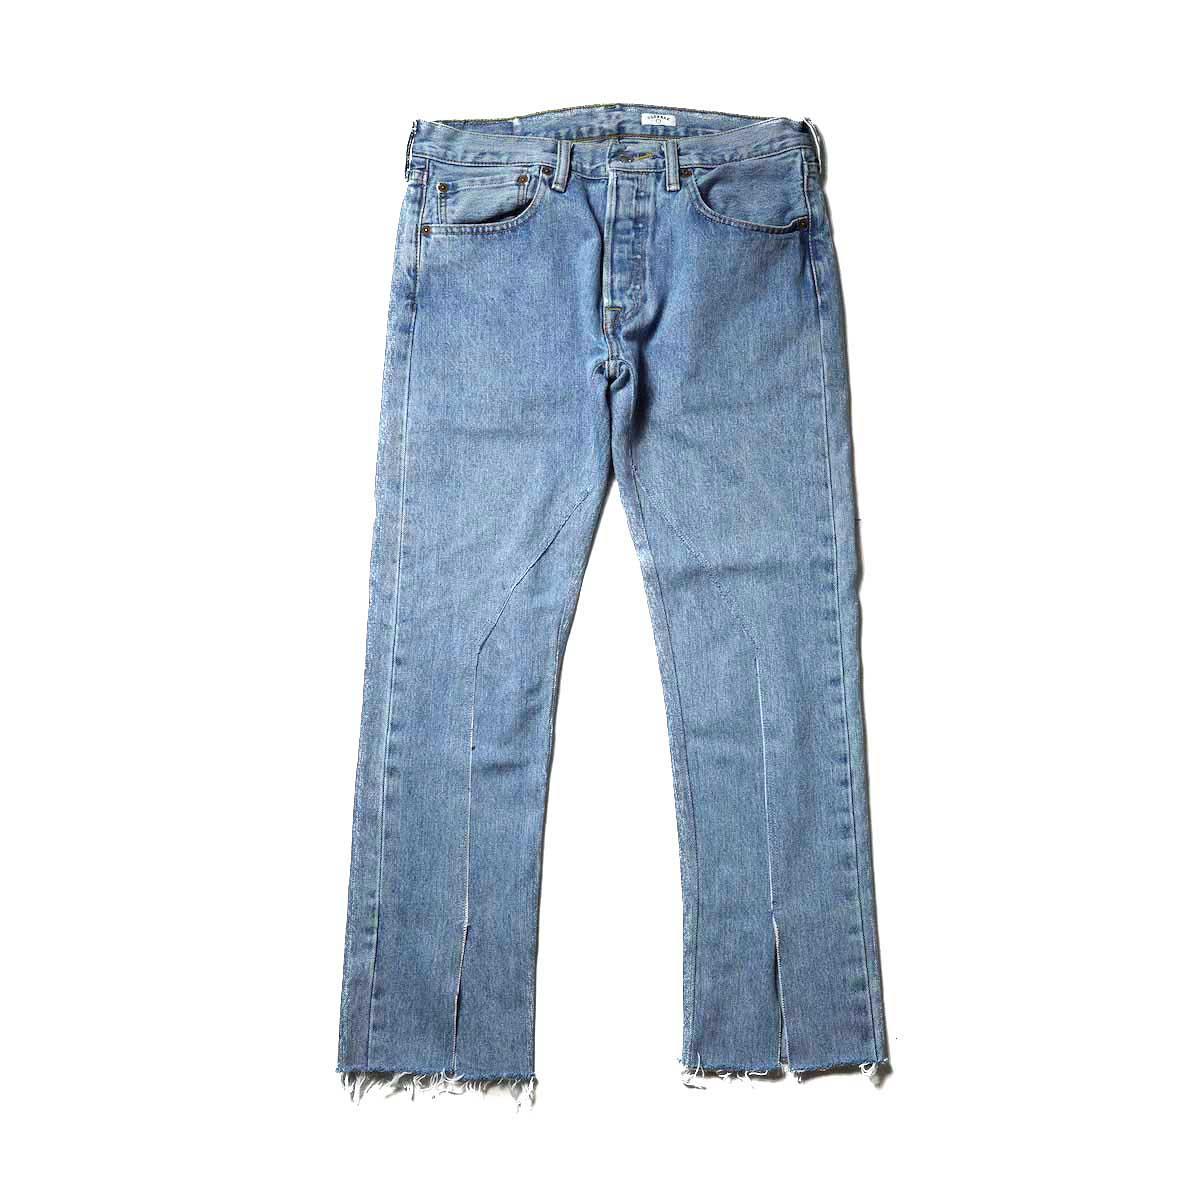 OLD PARK / Slit Jeans (Blue) Msize-A